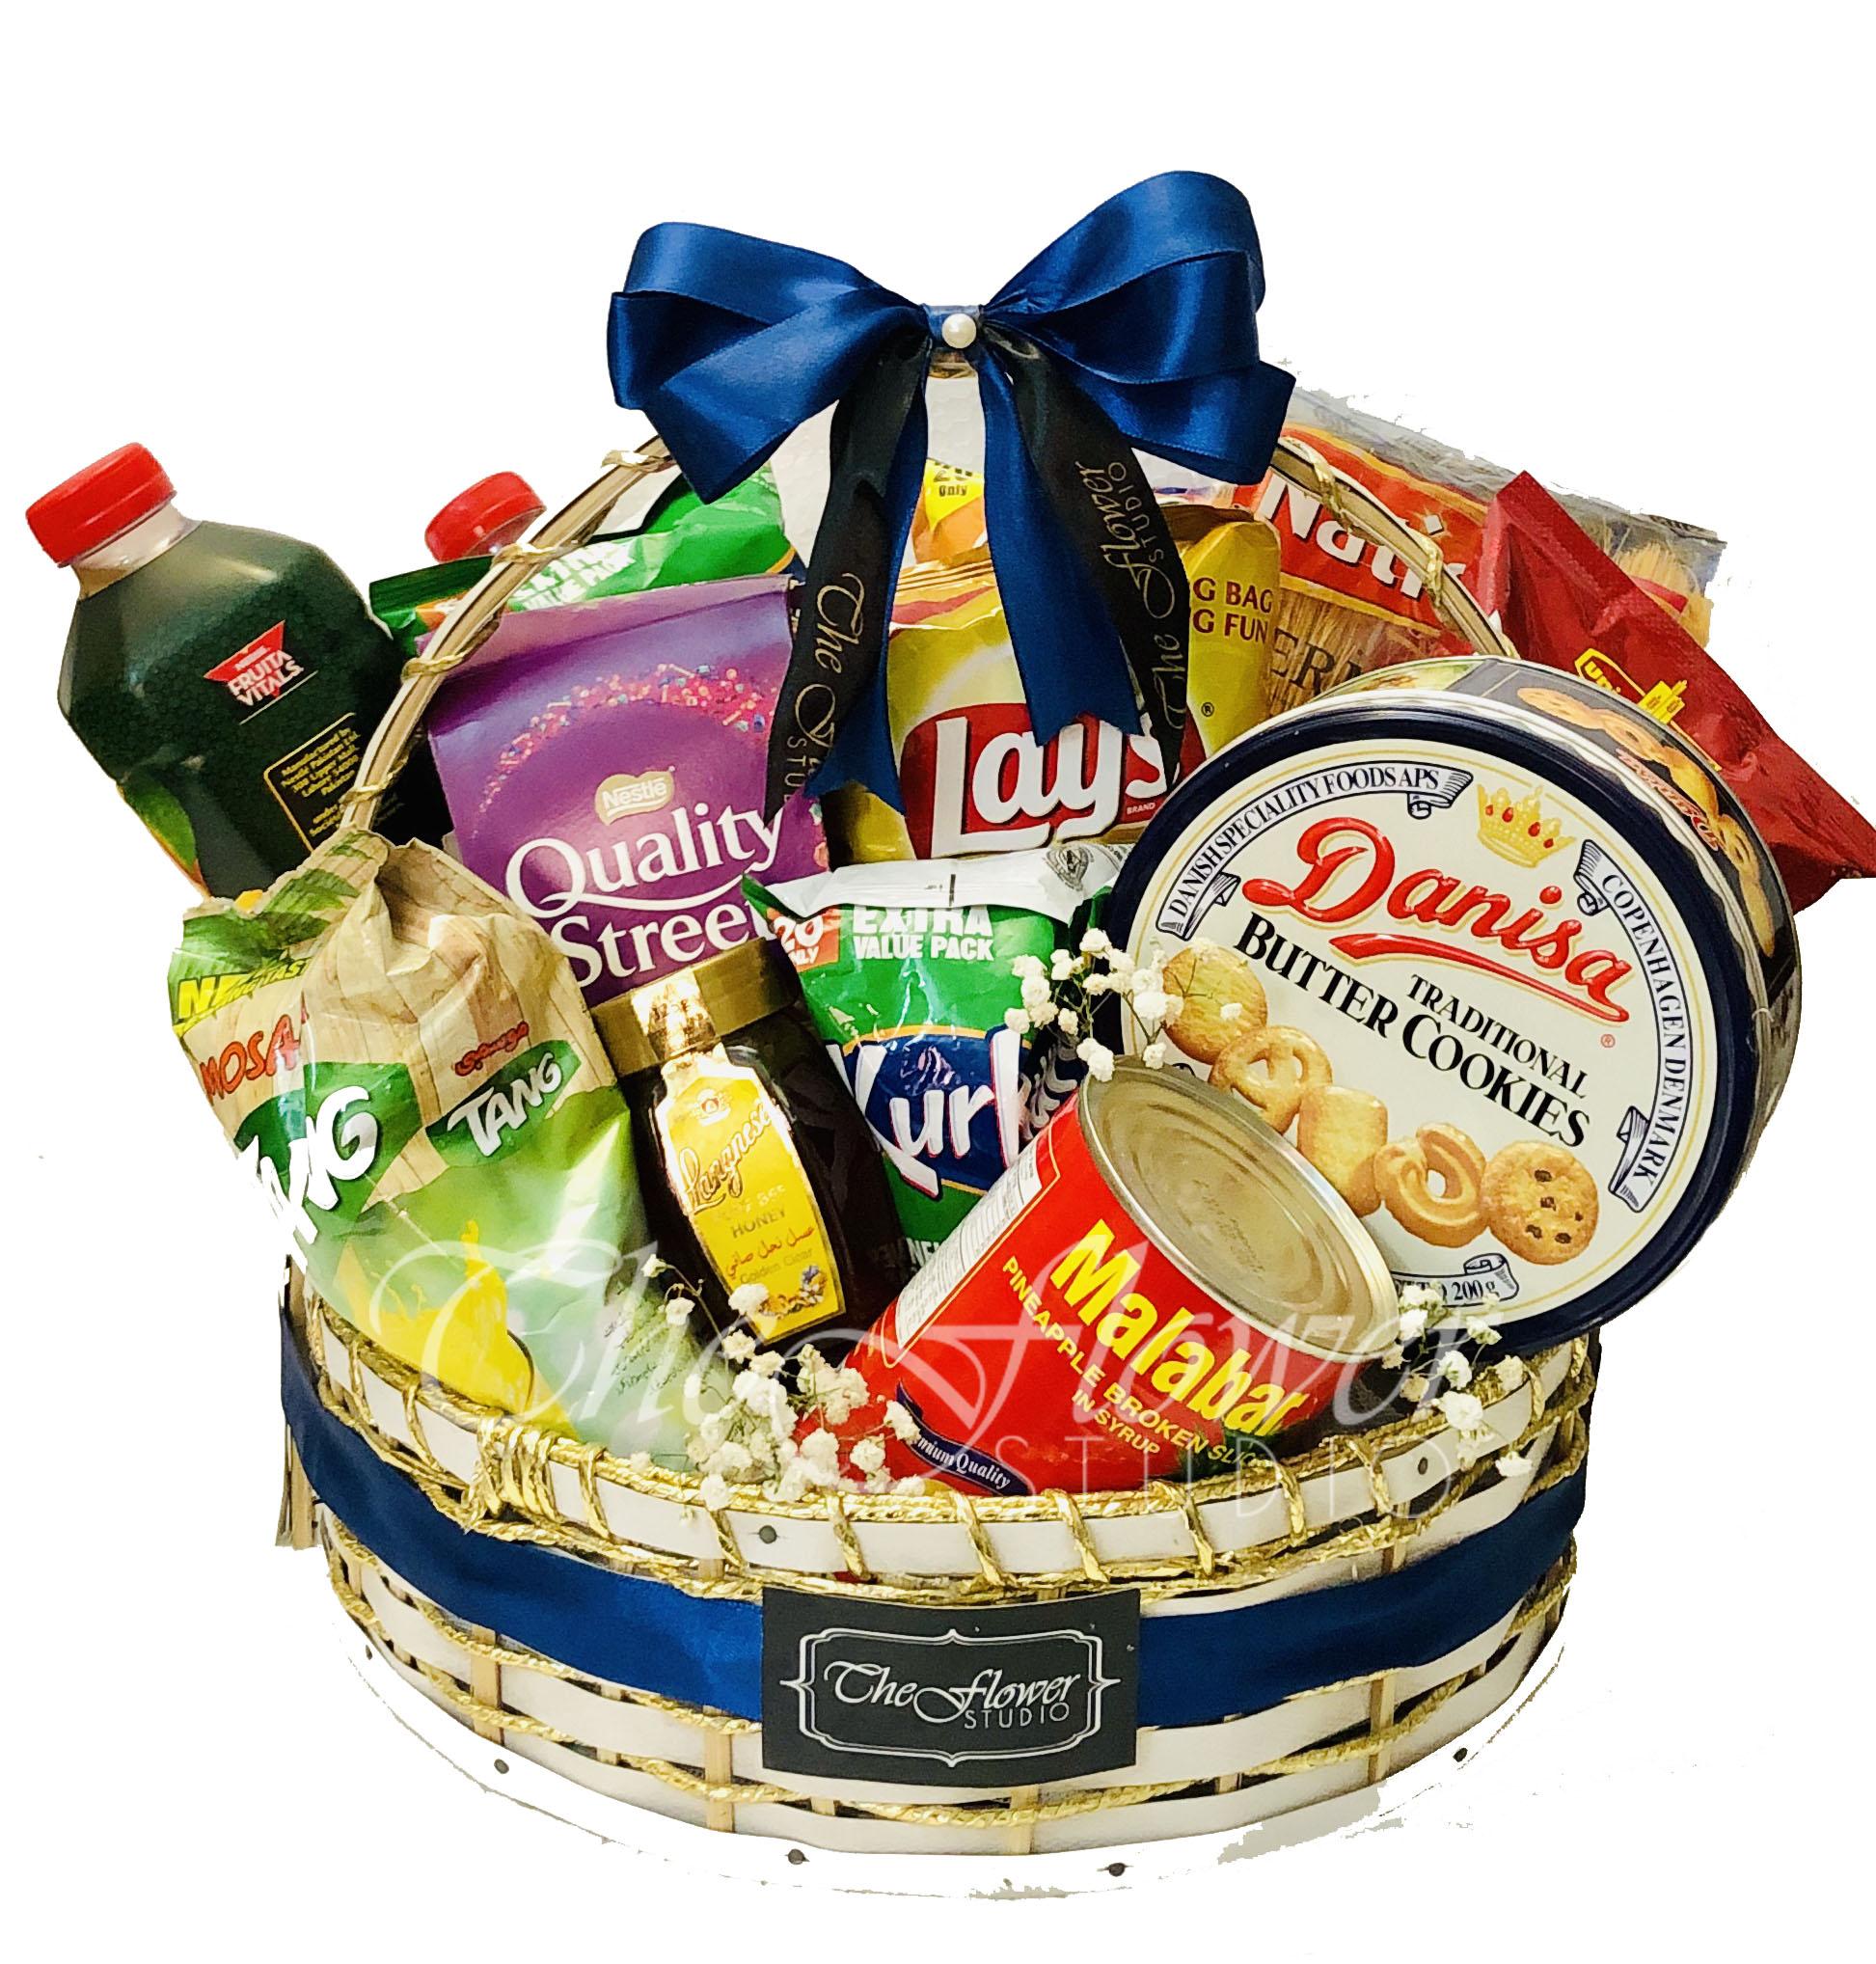 Gourmet Basket | Gift Baskets & Hampers | The Flower Studio